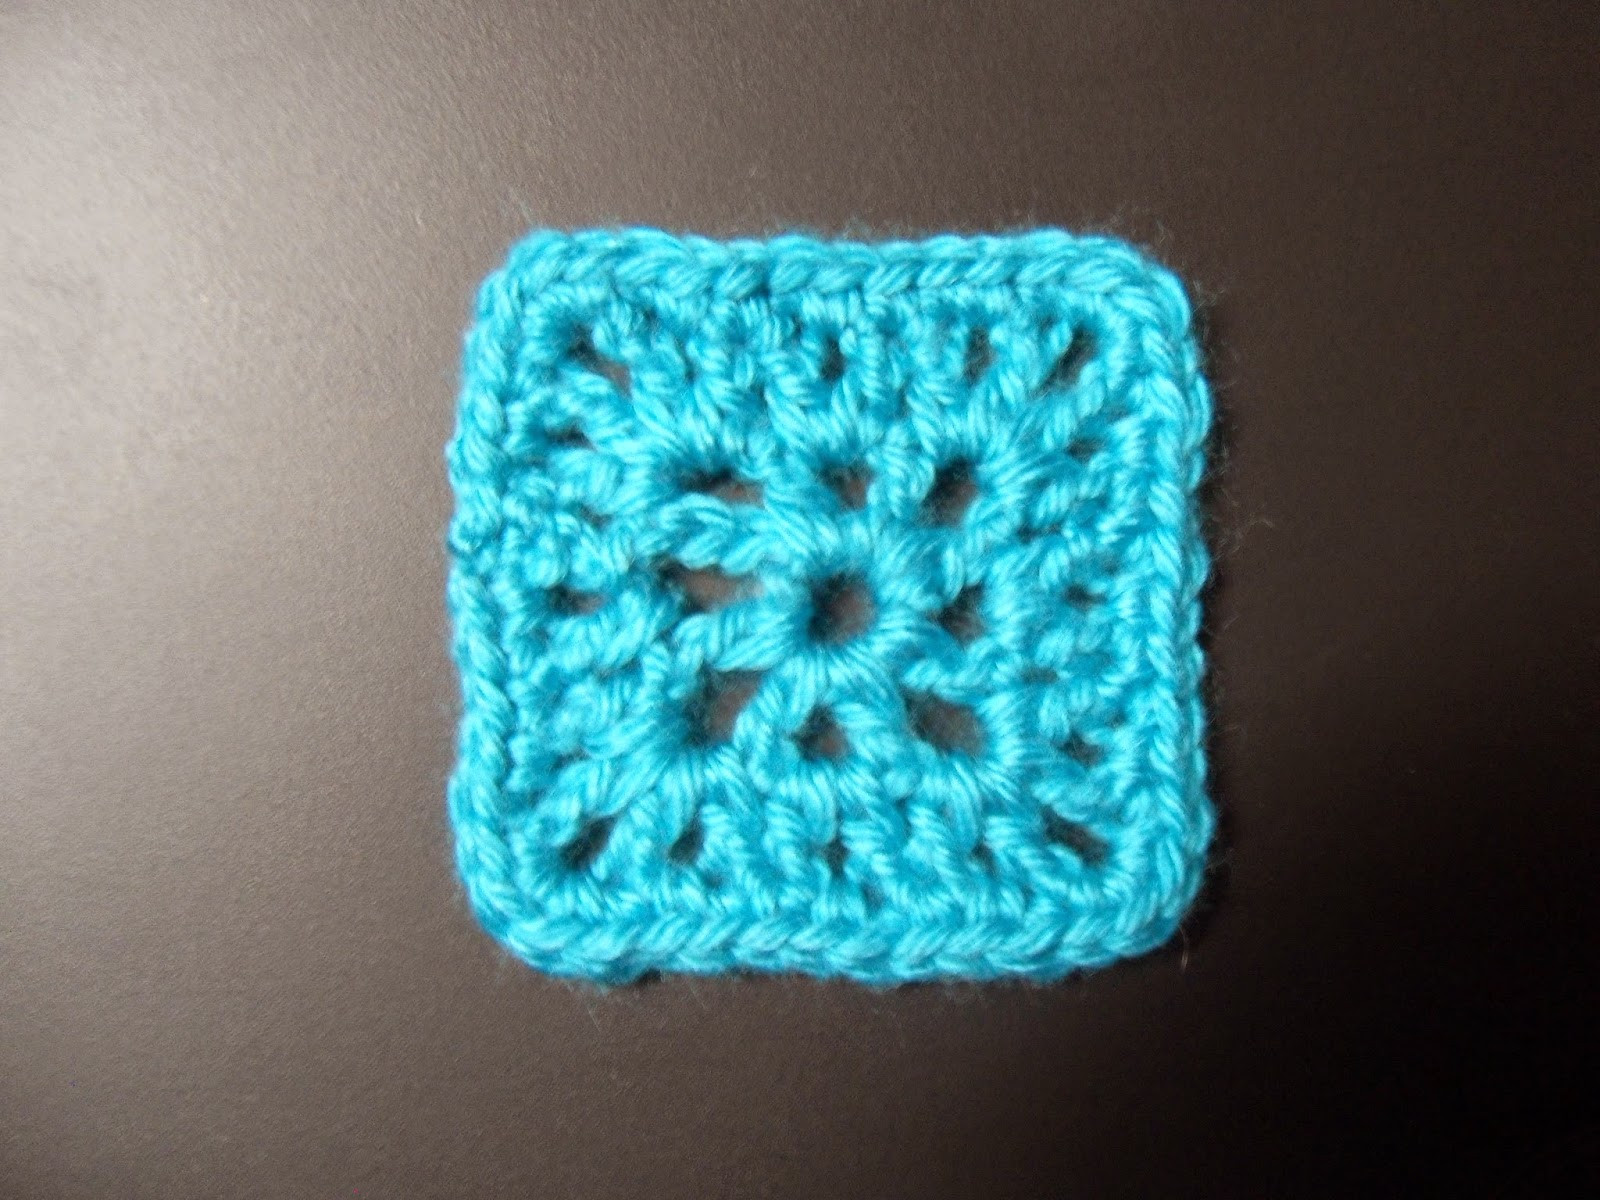 V Stitch Granny Square and or Motif by Manda Proell of MandaLynn's Crochet Treasures